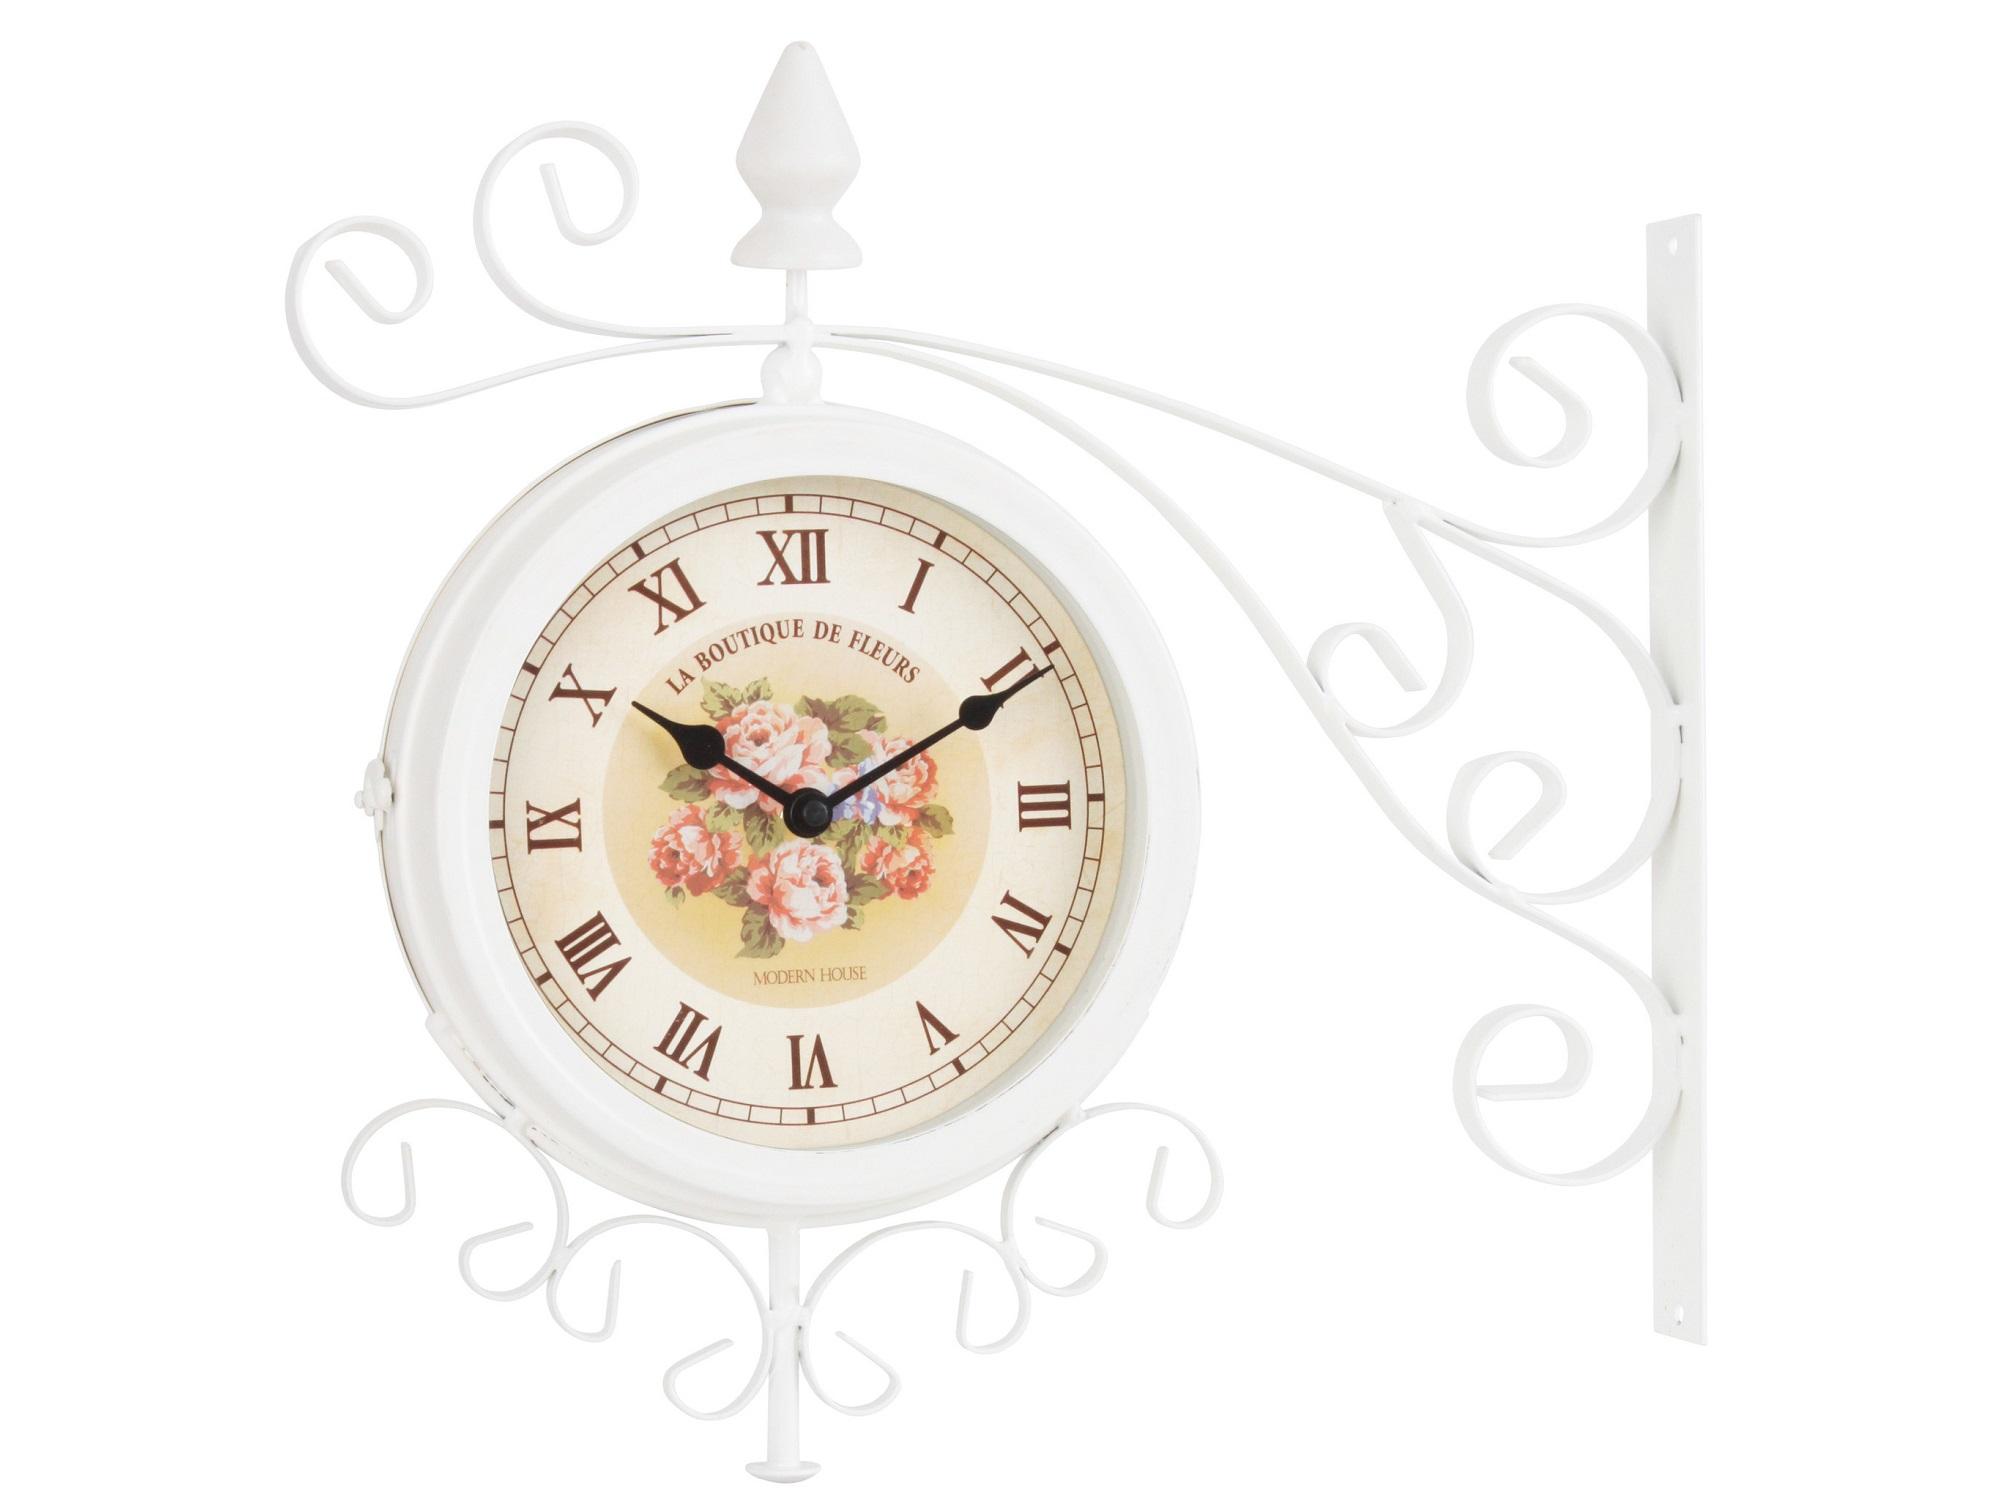 Настенные часы MelissaНастенные часы<br>Кварцевый механизм<br><br>Material: Металл<br>Ширина см: 40.0<br>Высота см: 38.0<br>Глубина см: 8.5